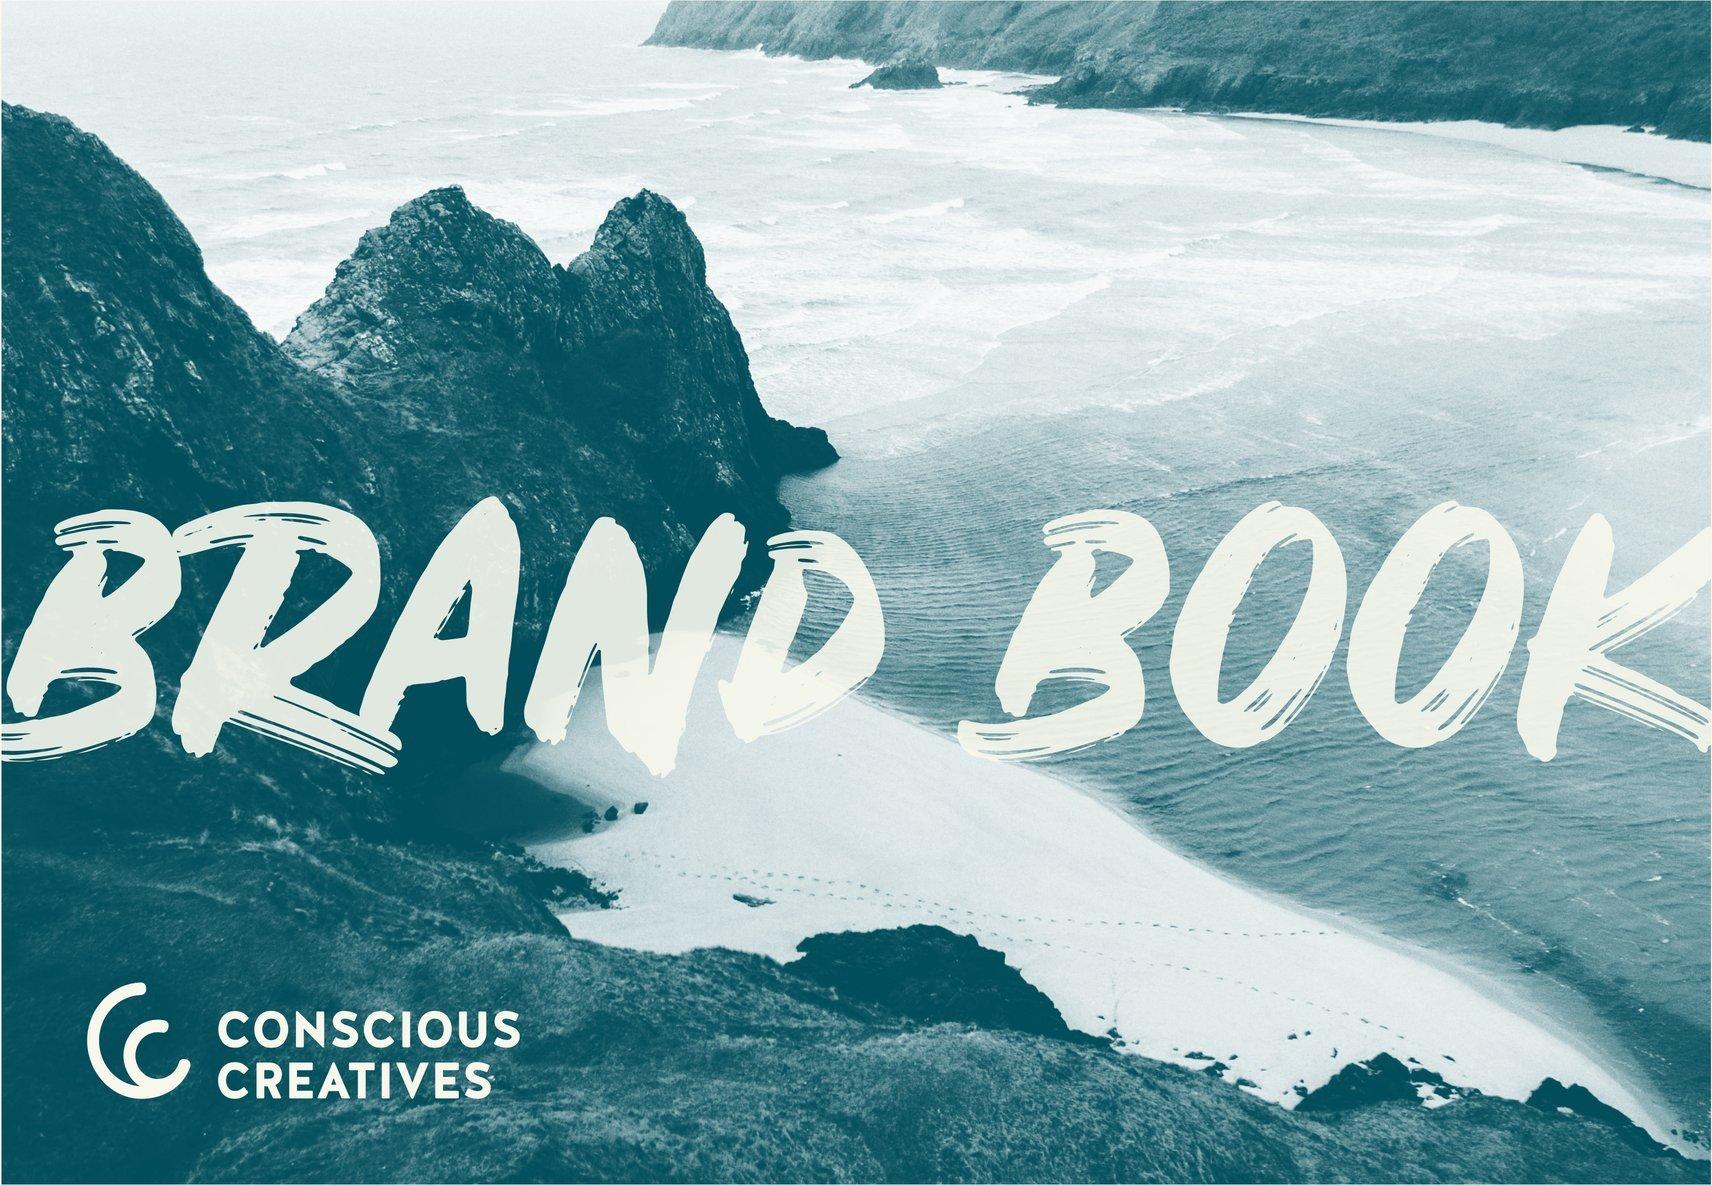 the Conscious Creatives branding guide